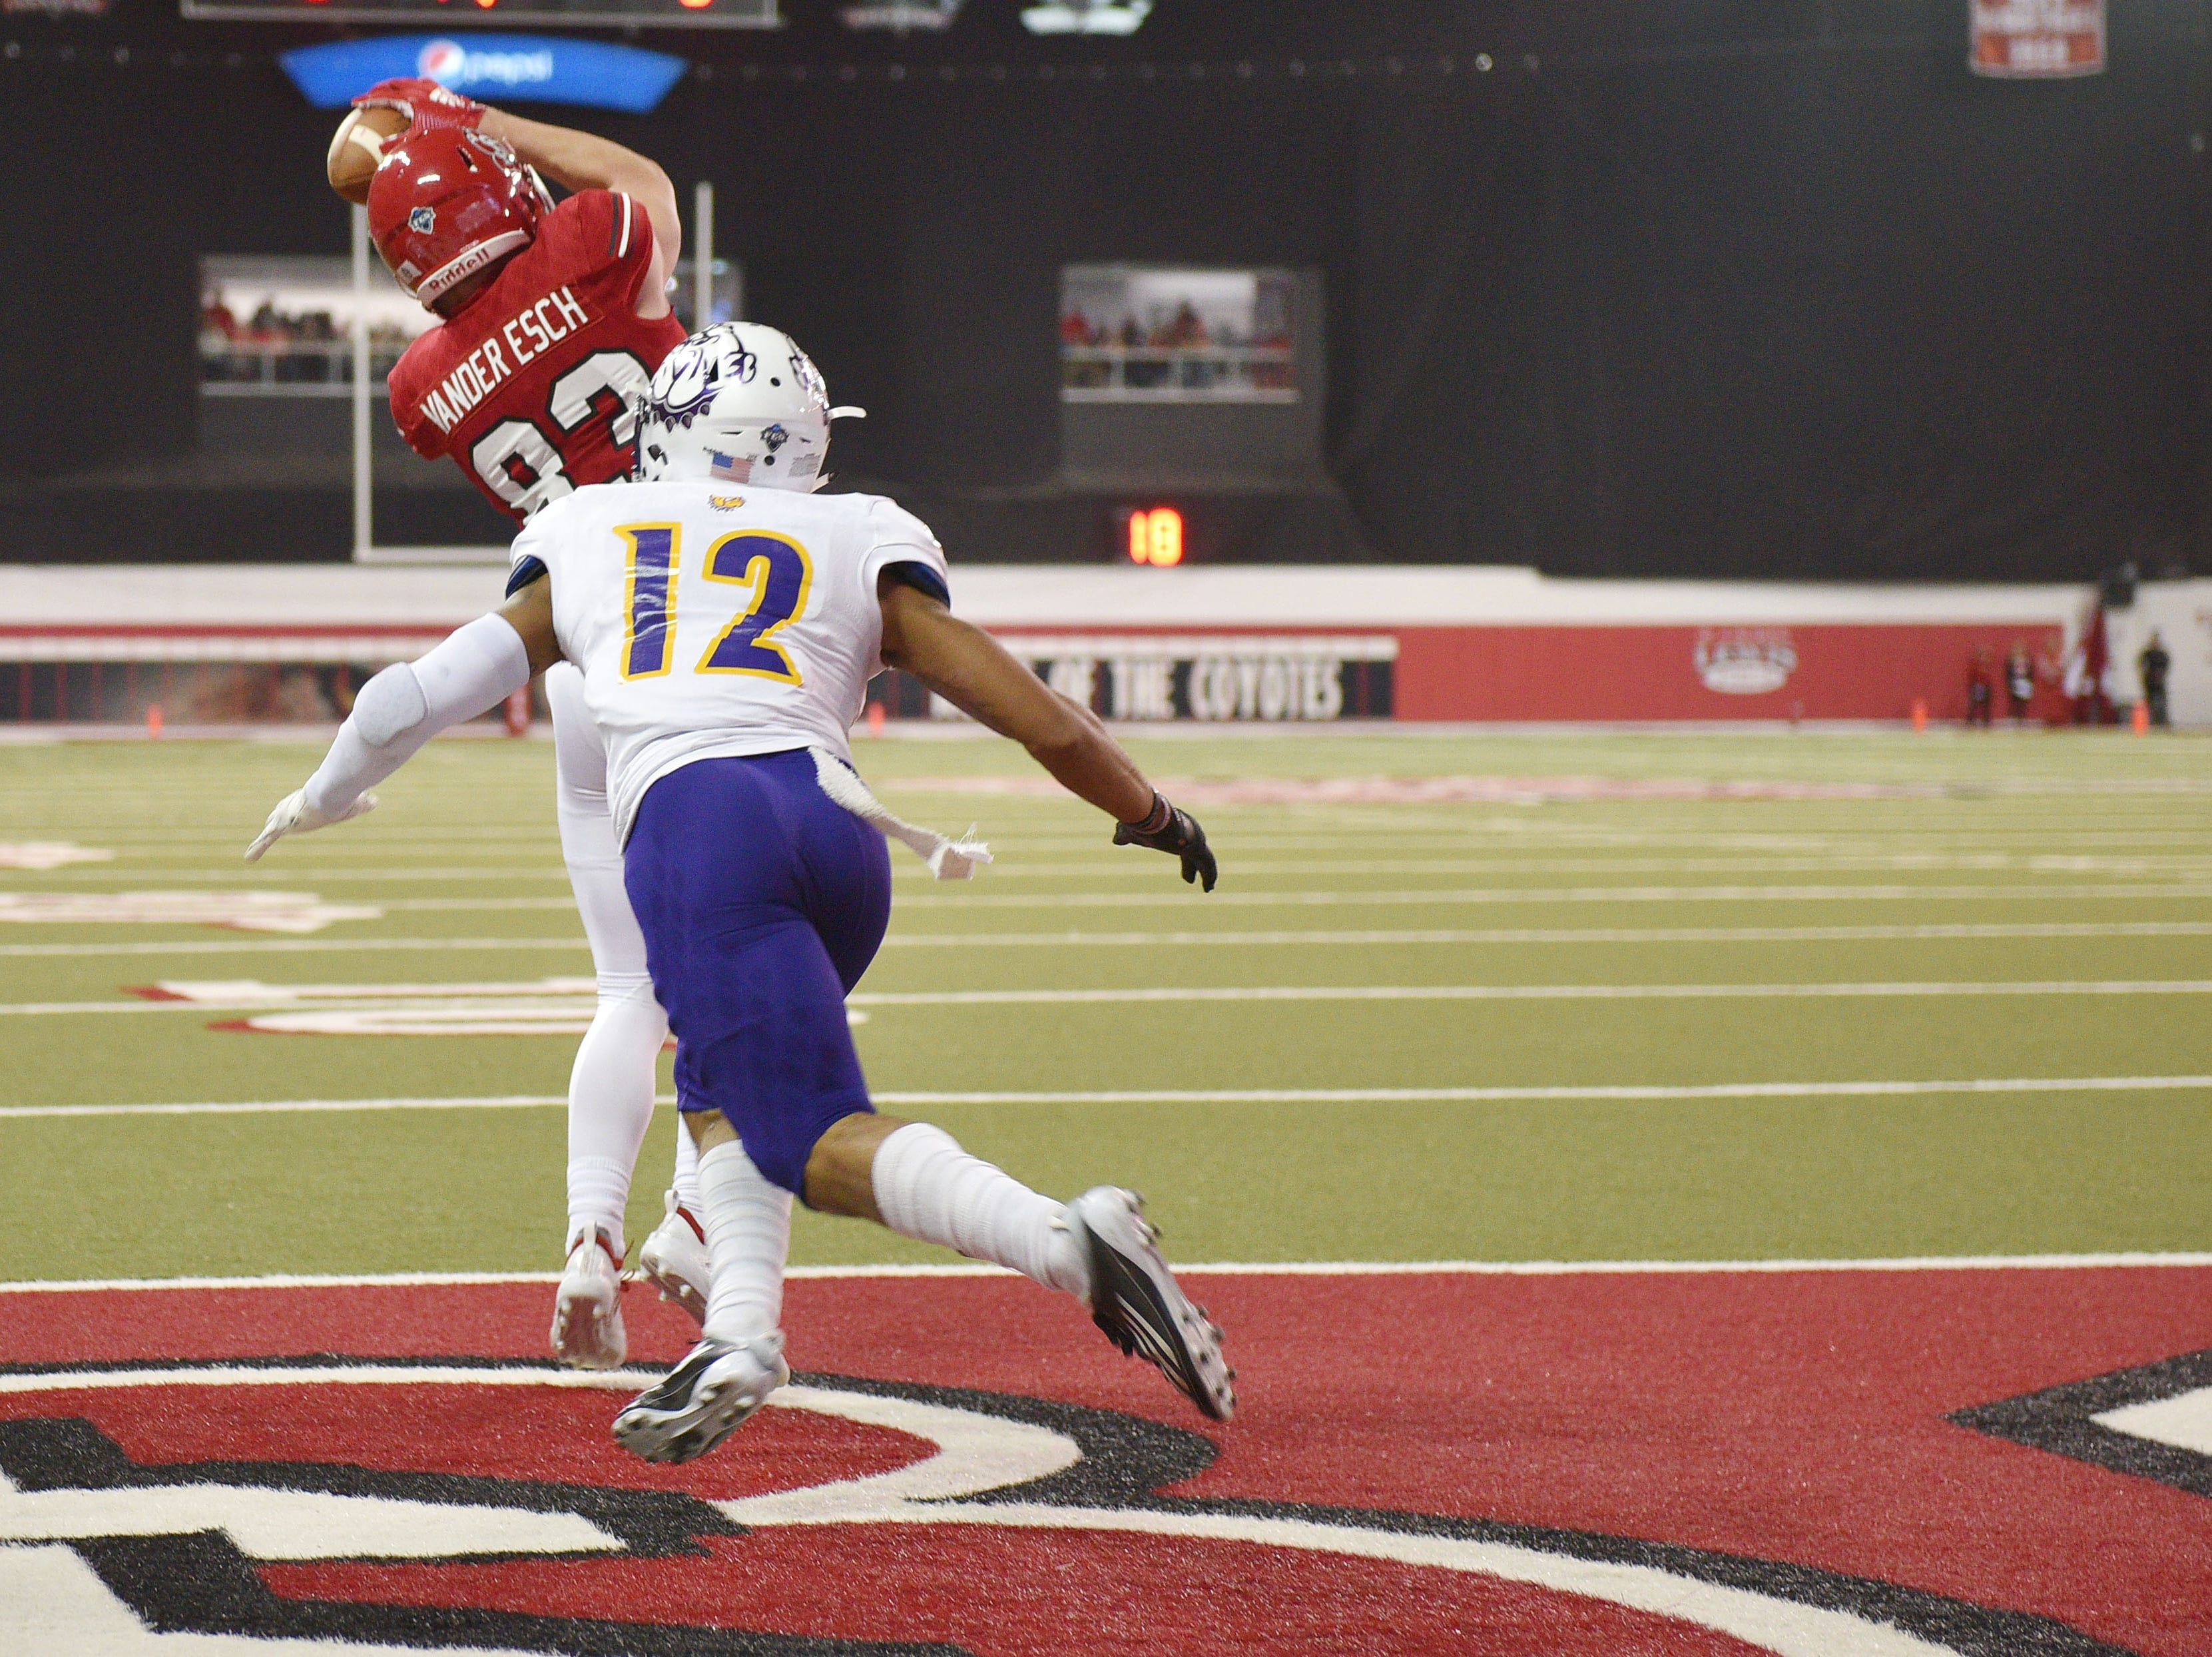 USD's Caleb Vander Esch scores a touchdown in the end zone against Western Illinois' Darron Wheeler during the game Saturday, Nov. 10, at the DakotaDome in Vermillion.